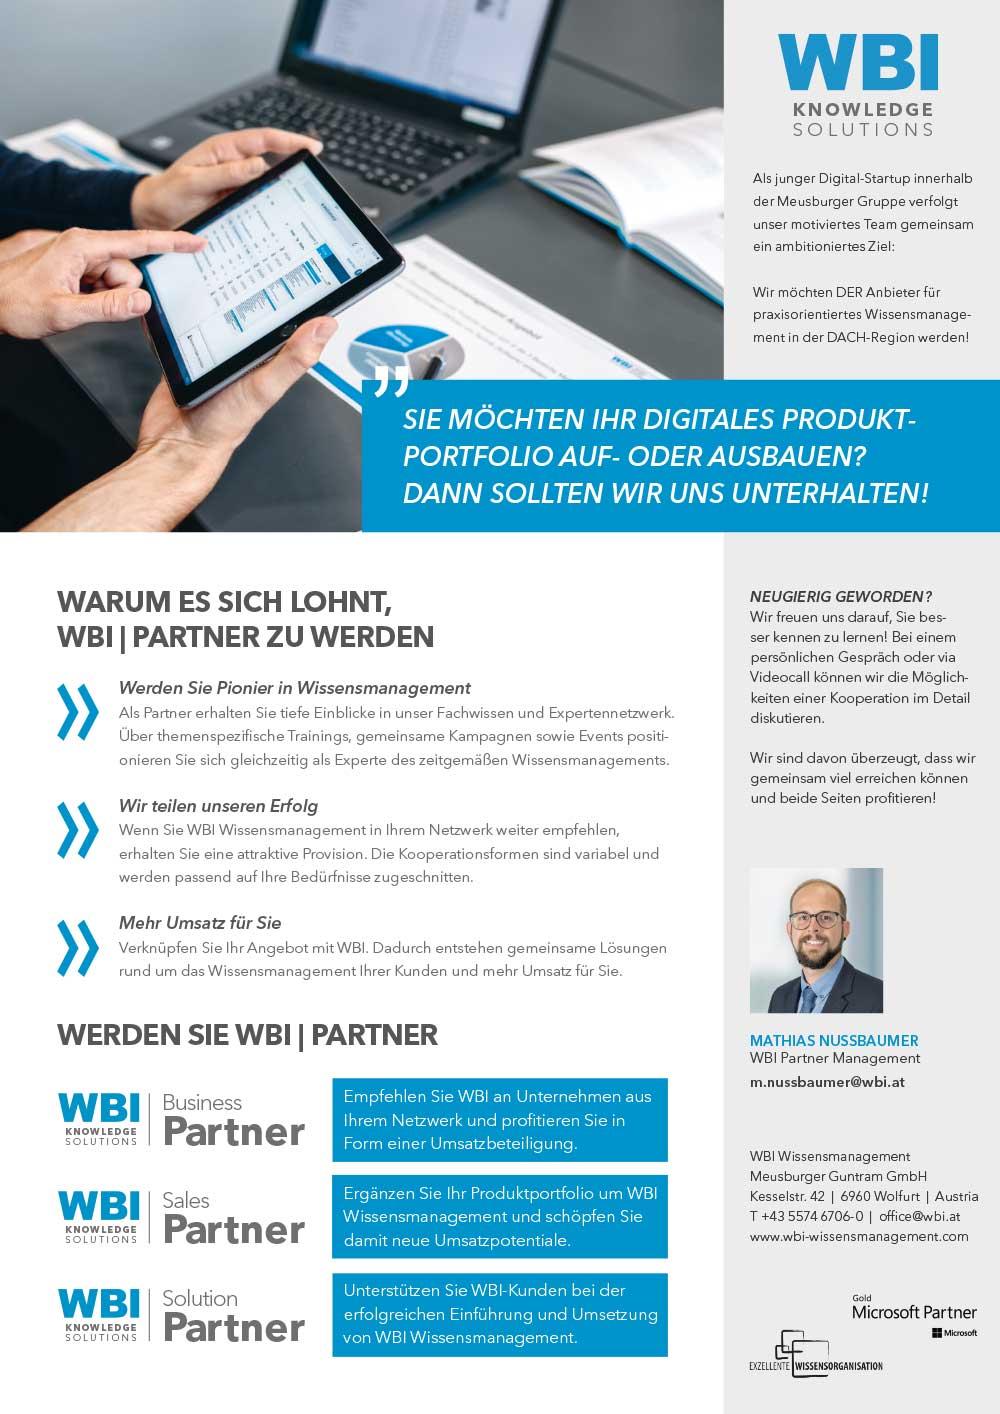 WBI-Partner-werden